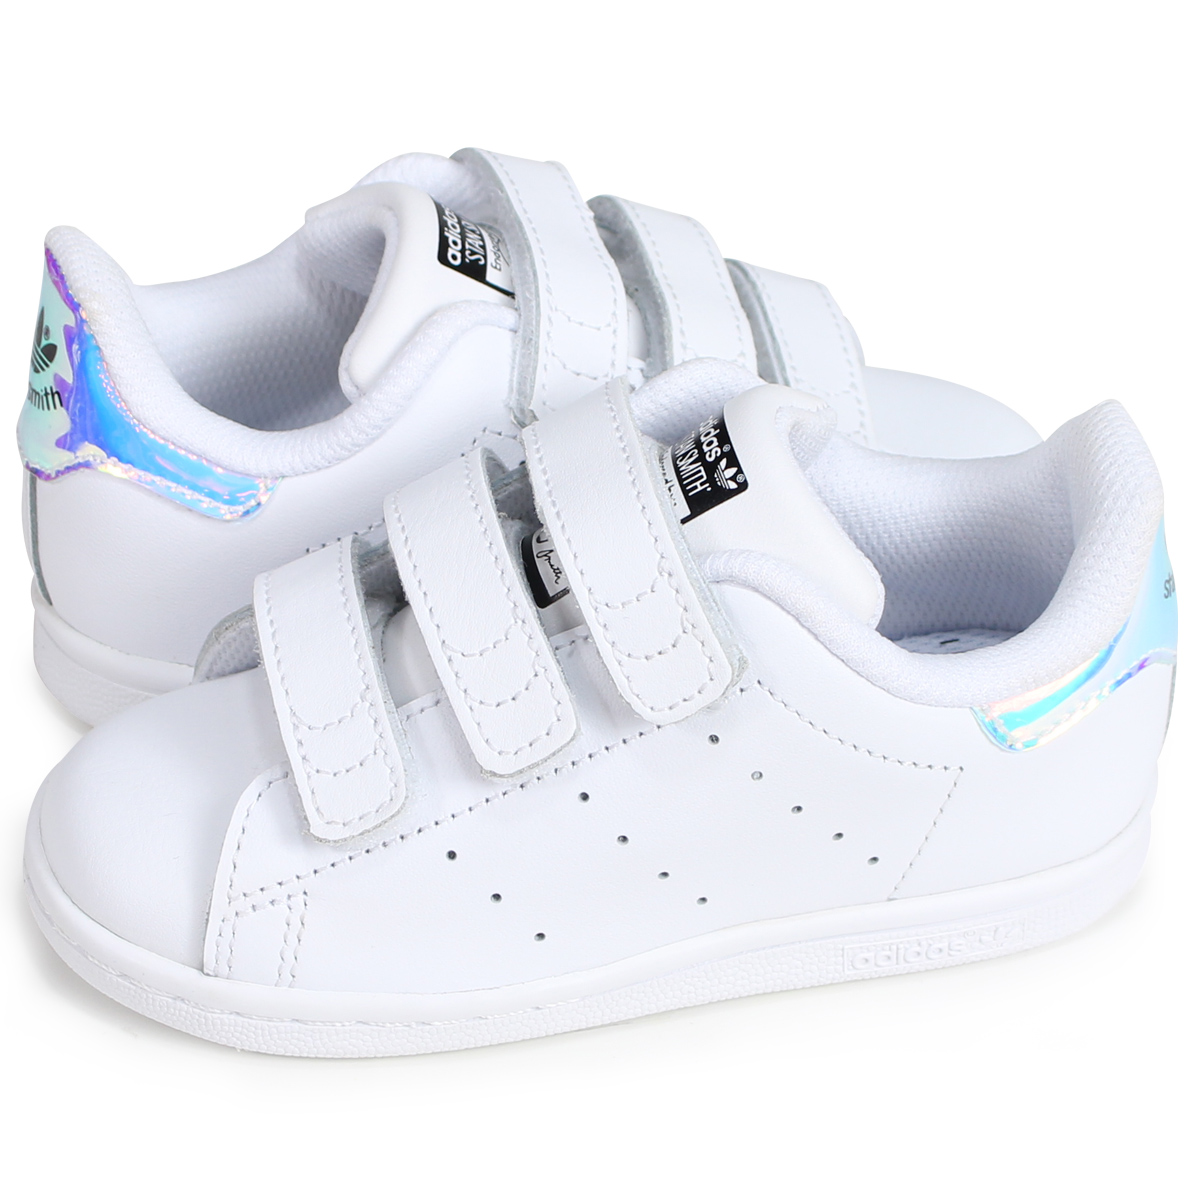 adidas Originals STAN SMITH CF I アディダス オリジナルス スタンスミス ベビー スニーカー A